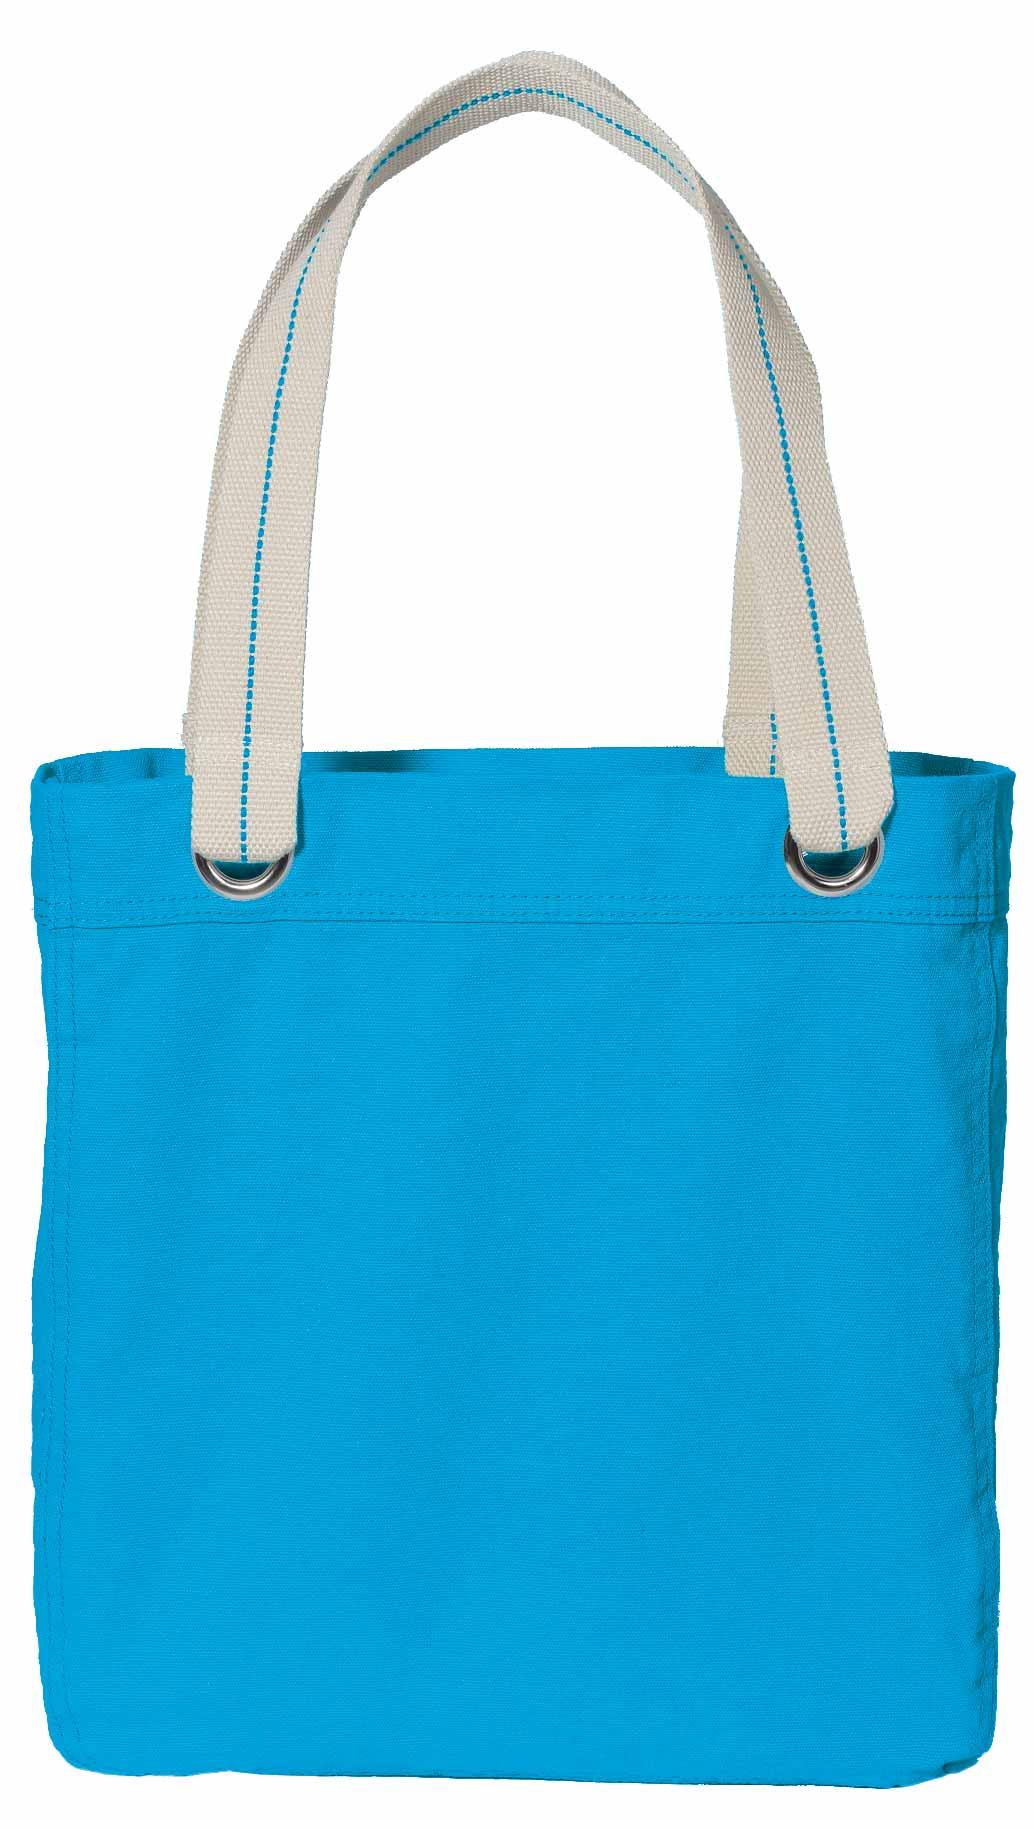 B118_Turquoise_Bag_GA11_web.jpg